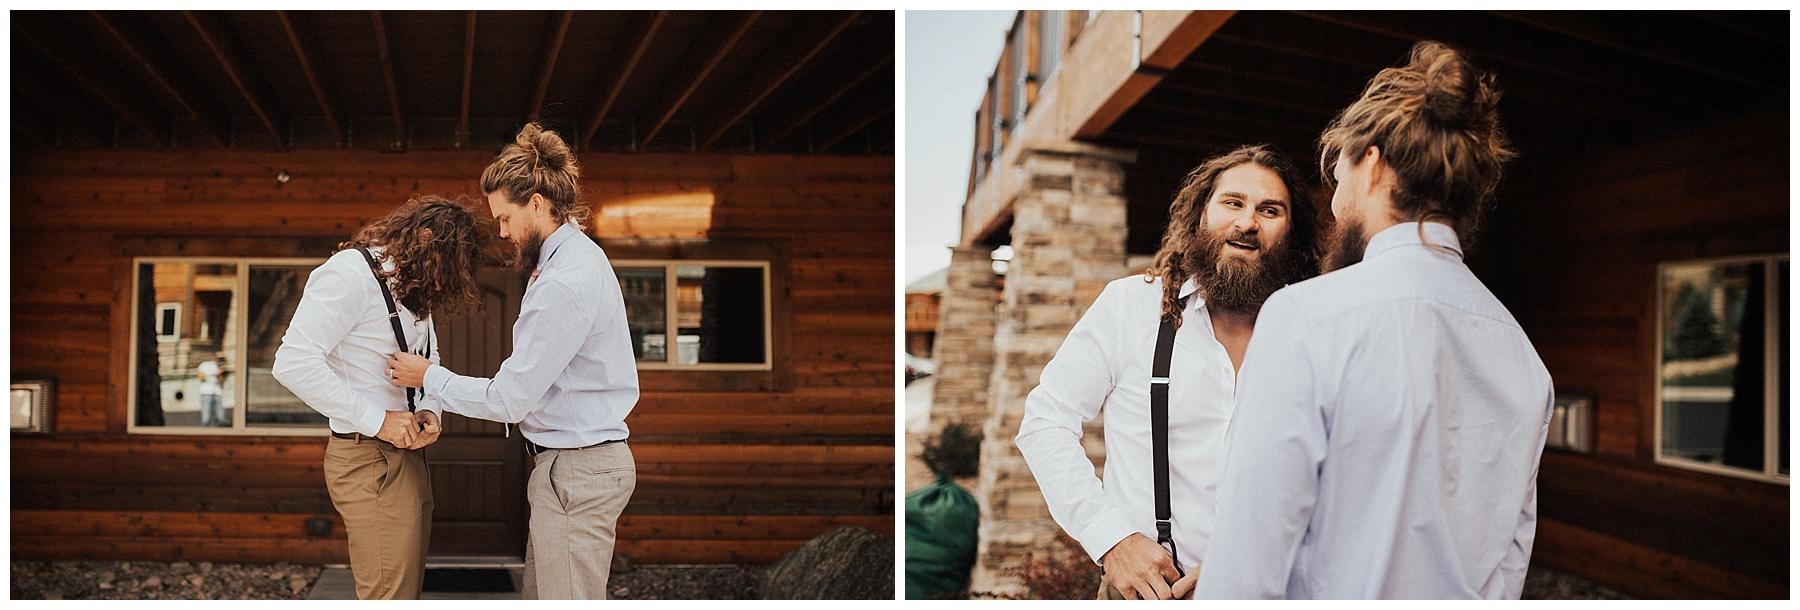 Colorado Destination Elopement Tampa Wedding Photographer-16.jpg